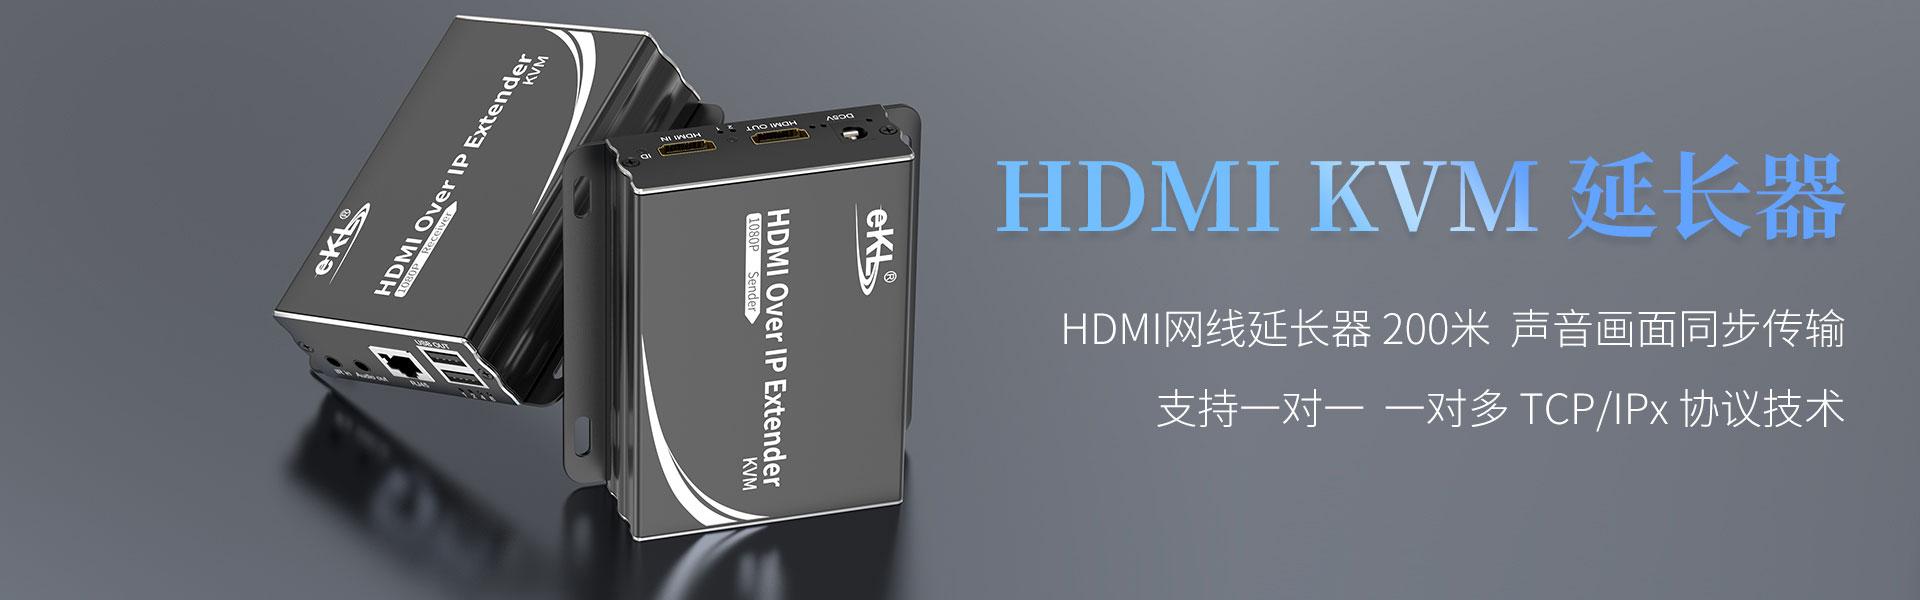 HDMI KVM延长器1对多/多对多HU150